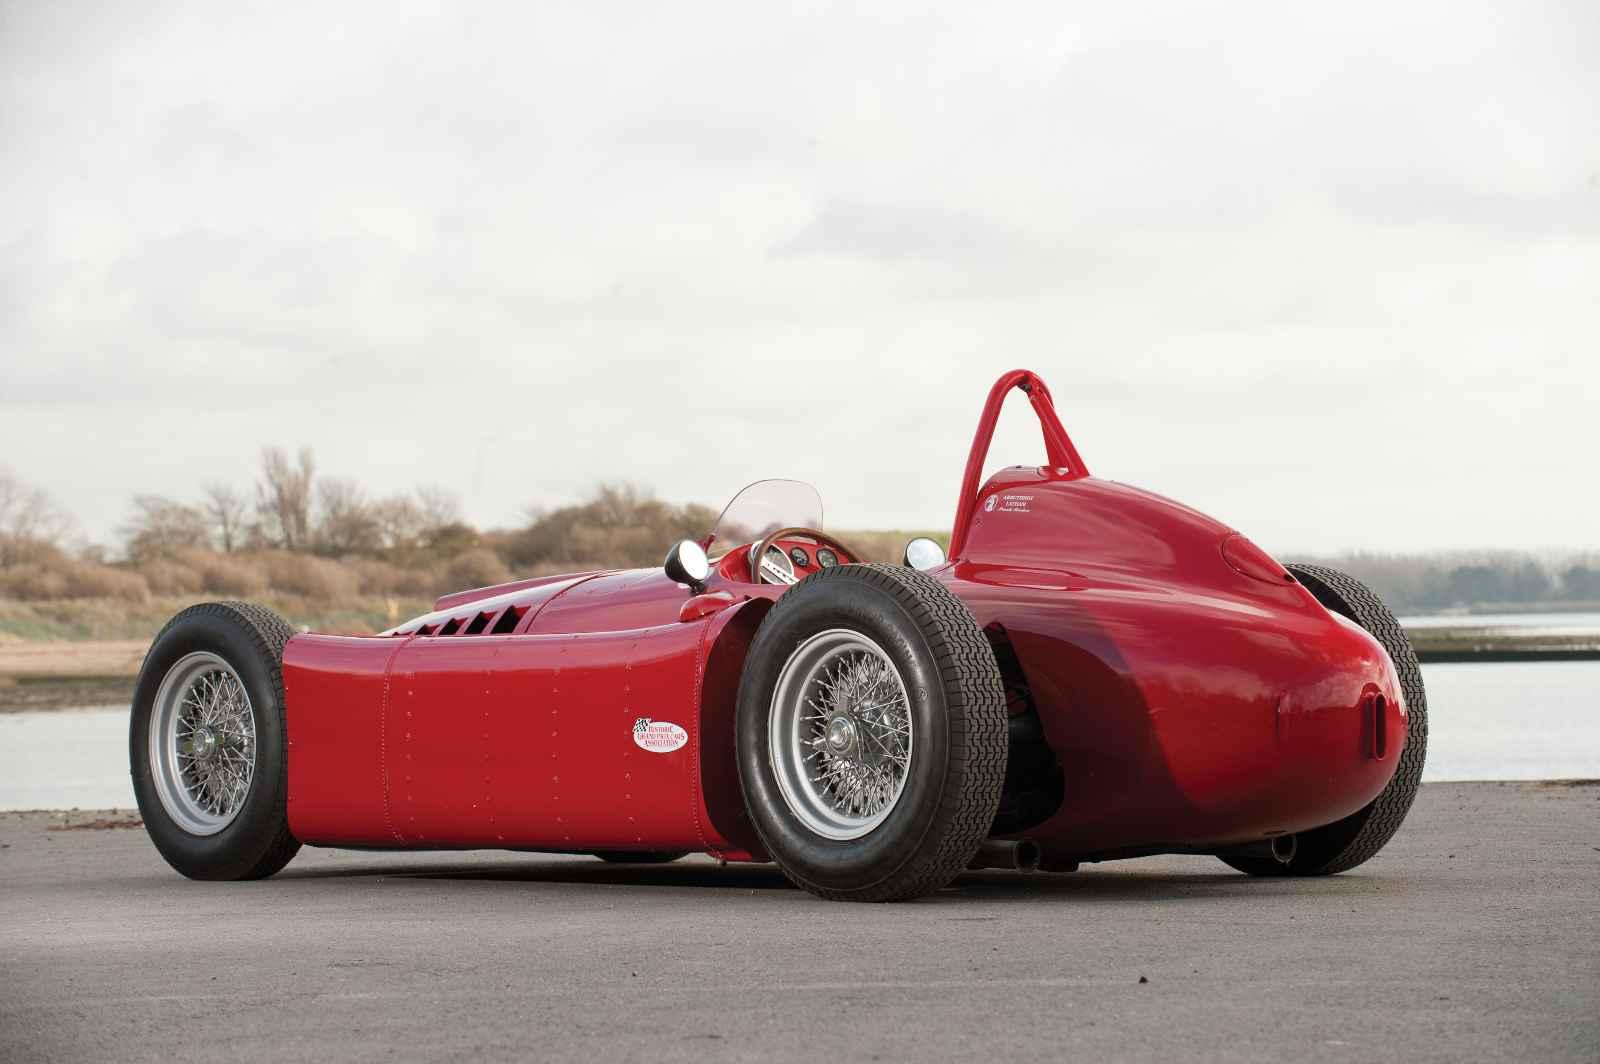 1955 Lancia D50 A Formula One